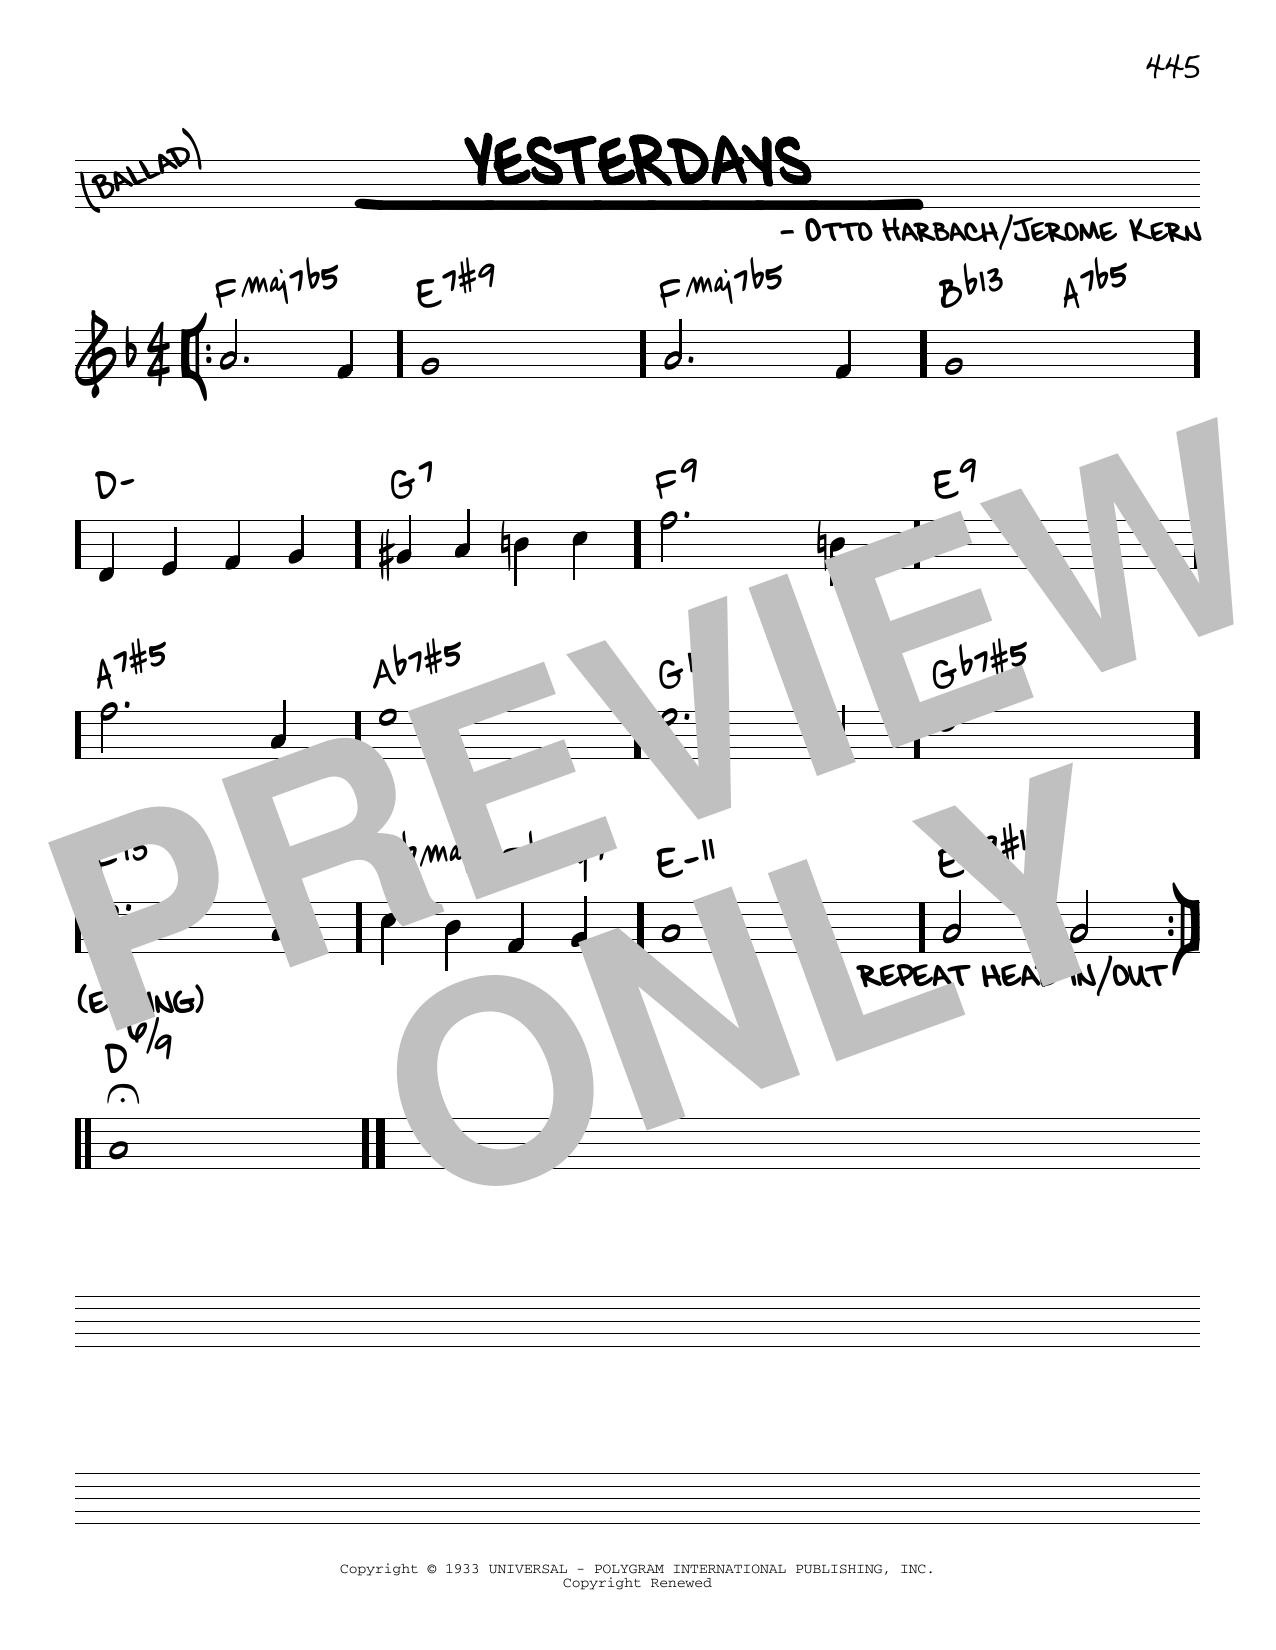 Otto Harbach Yesterdays [Reharmonized version] (arr. Jack Grassel) sheet music notes printable PDF score